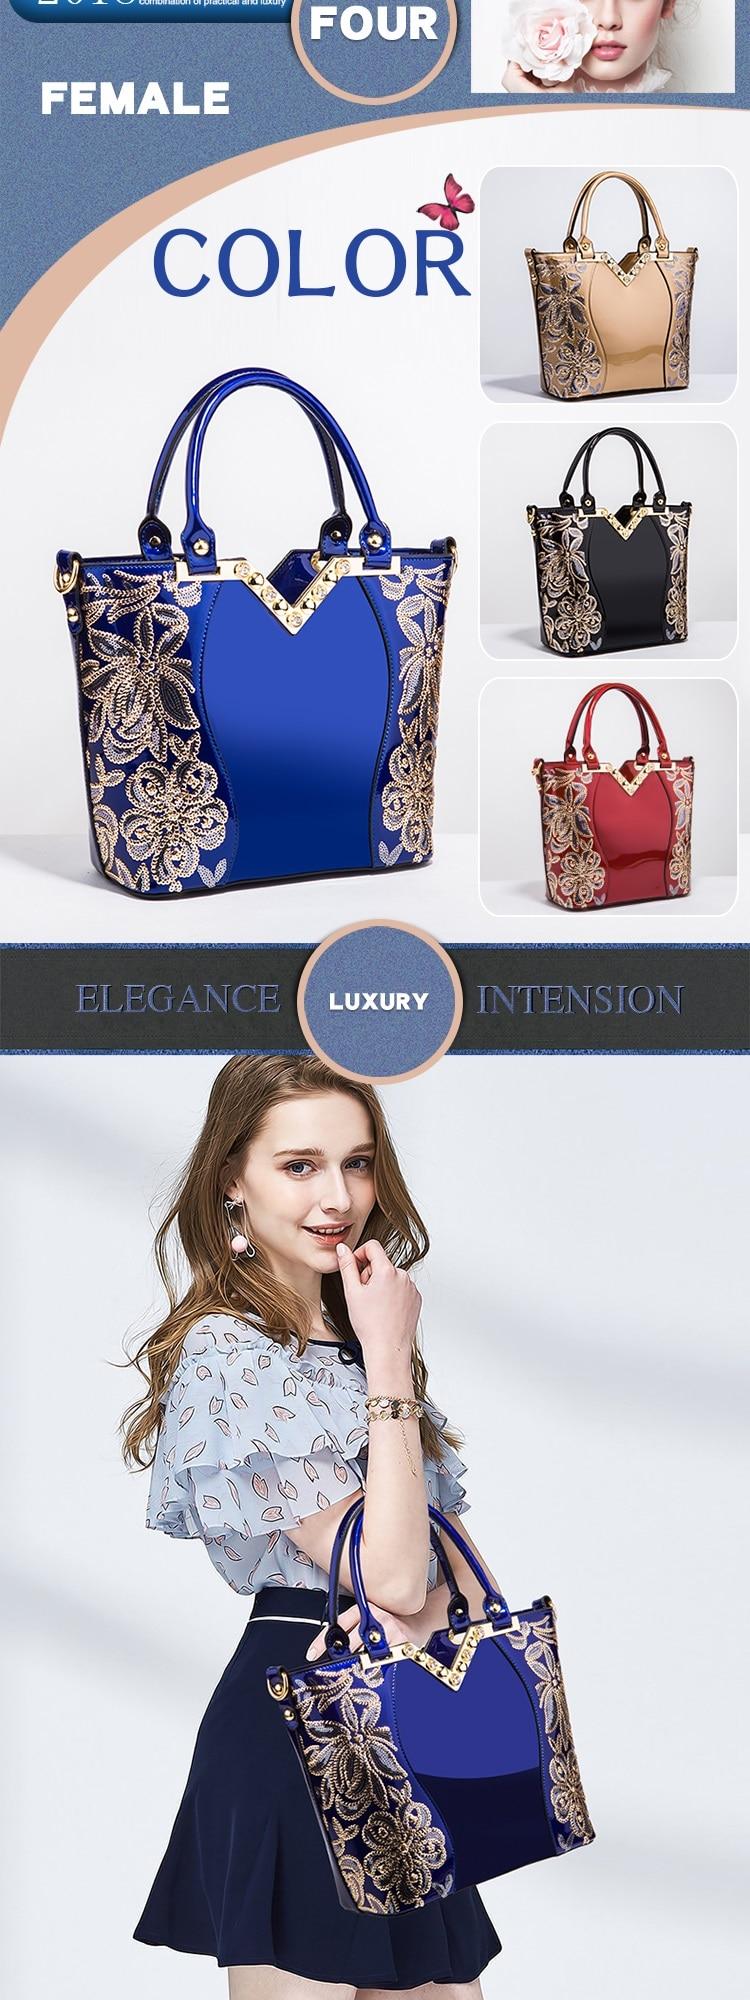 Bolsas de couro grande bolsa feminina de